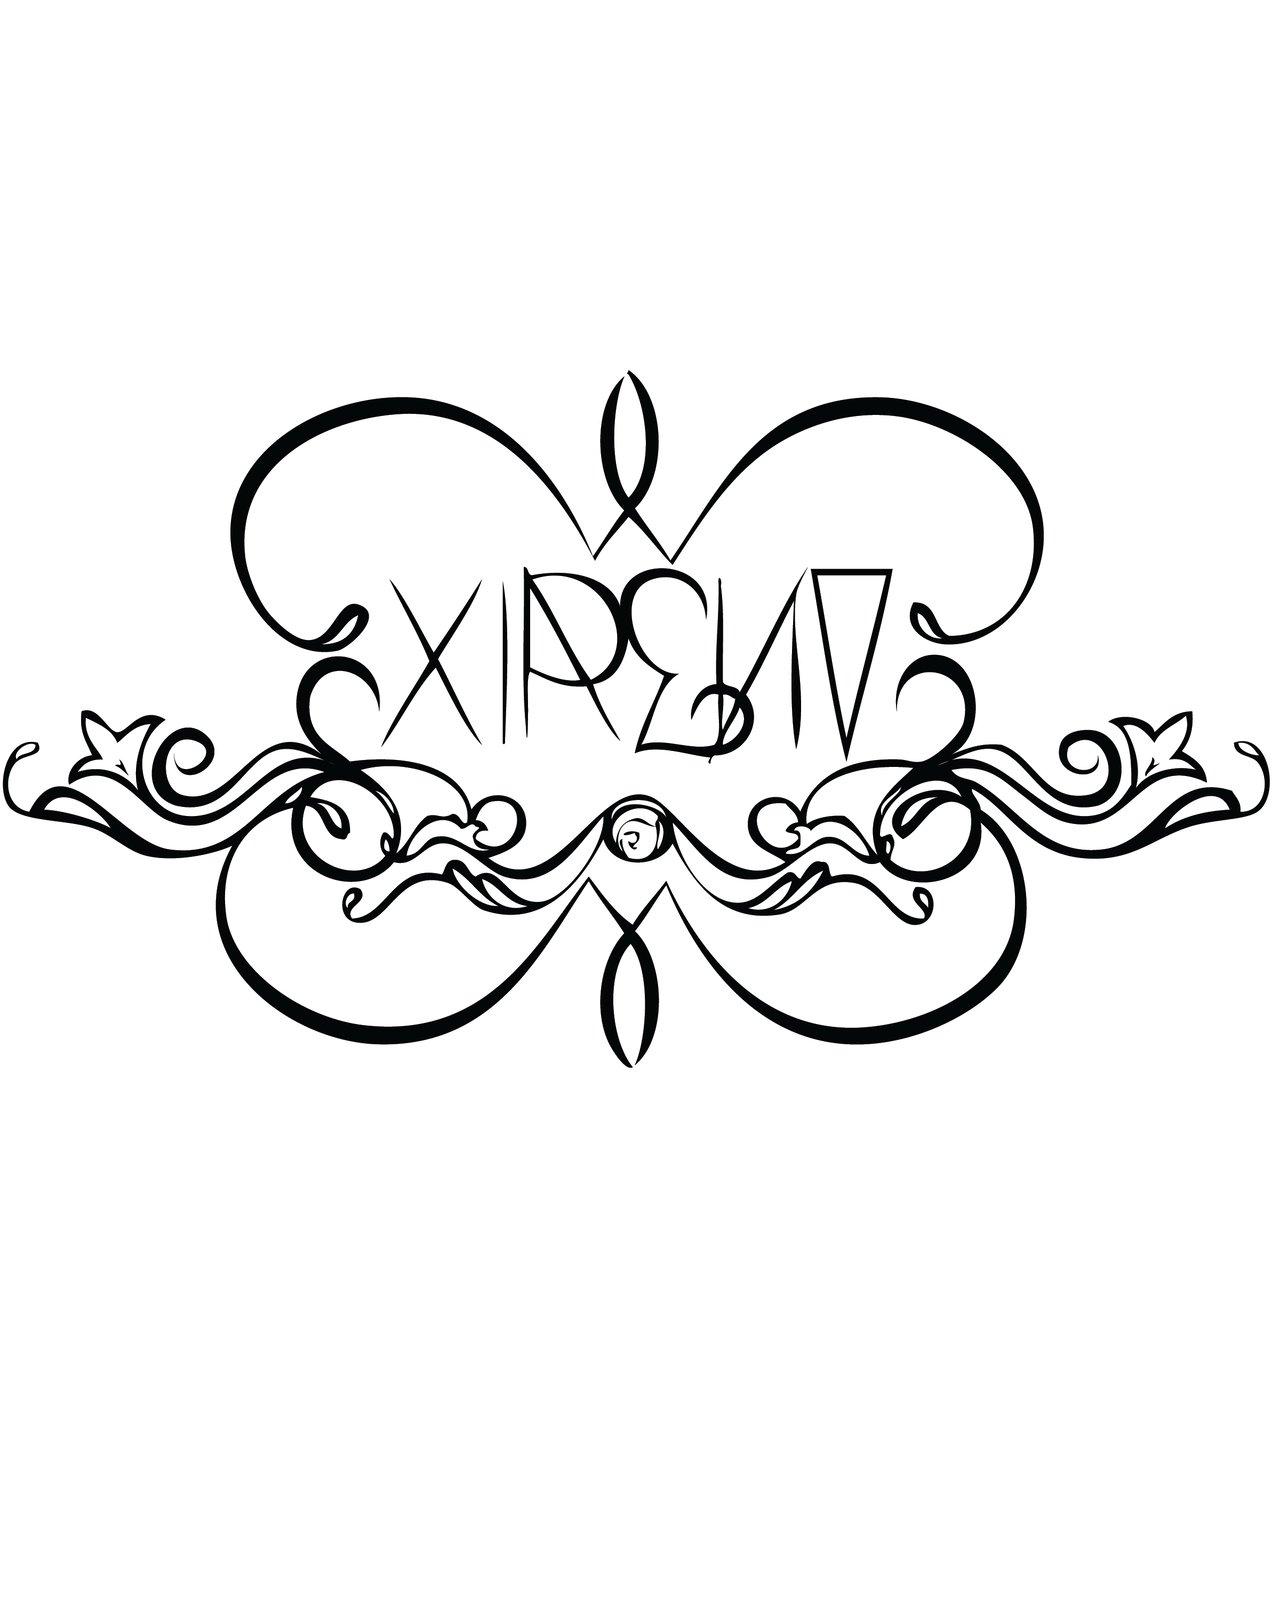 XIRENV's account image